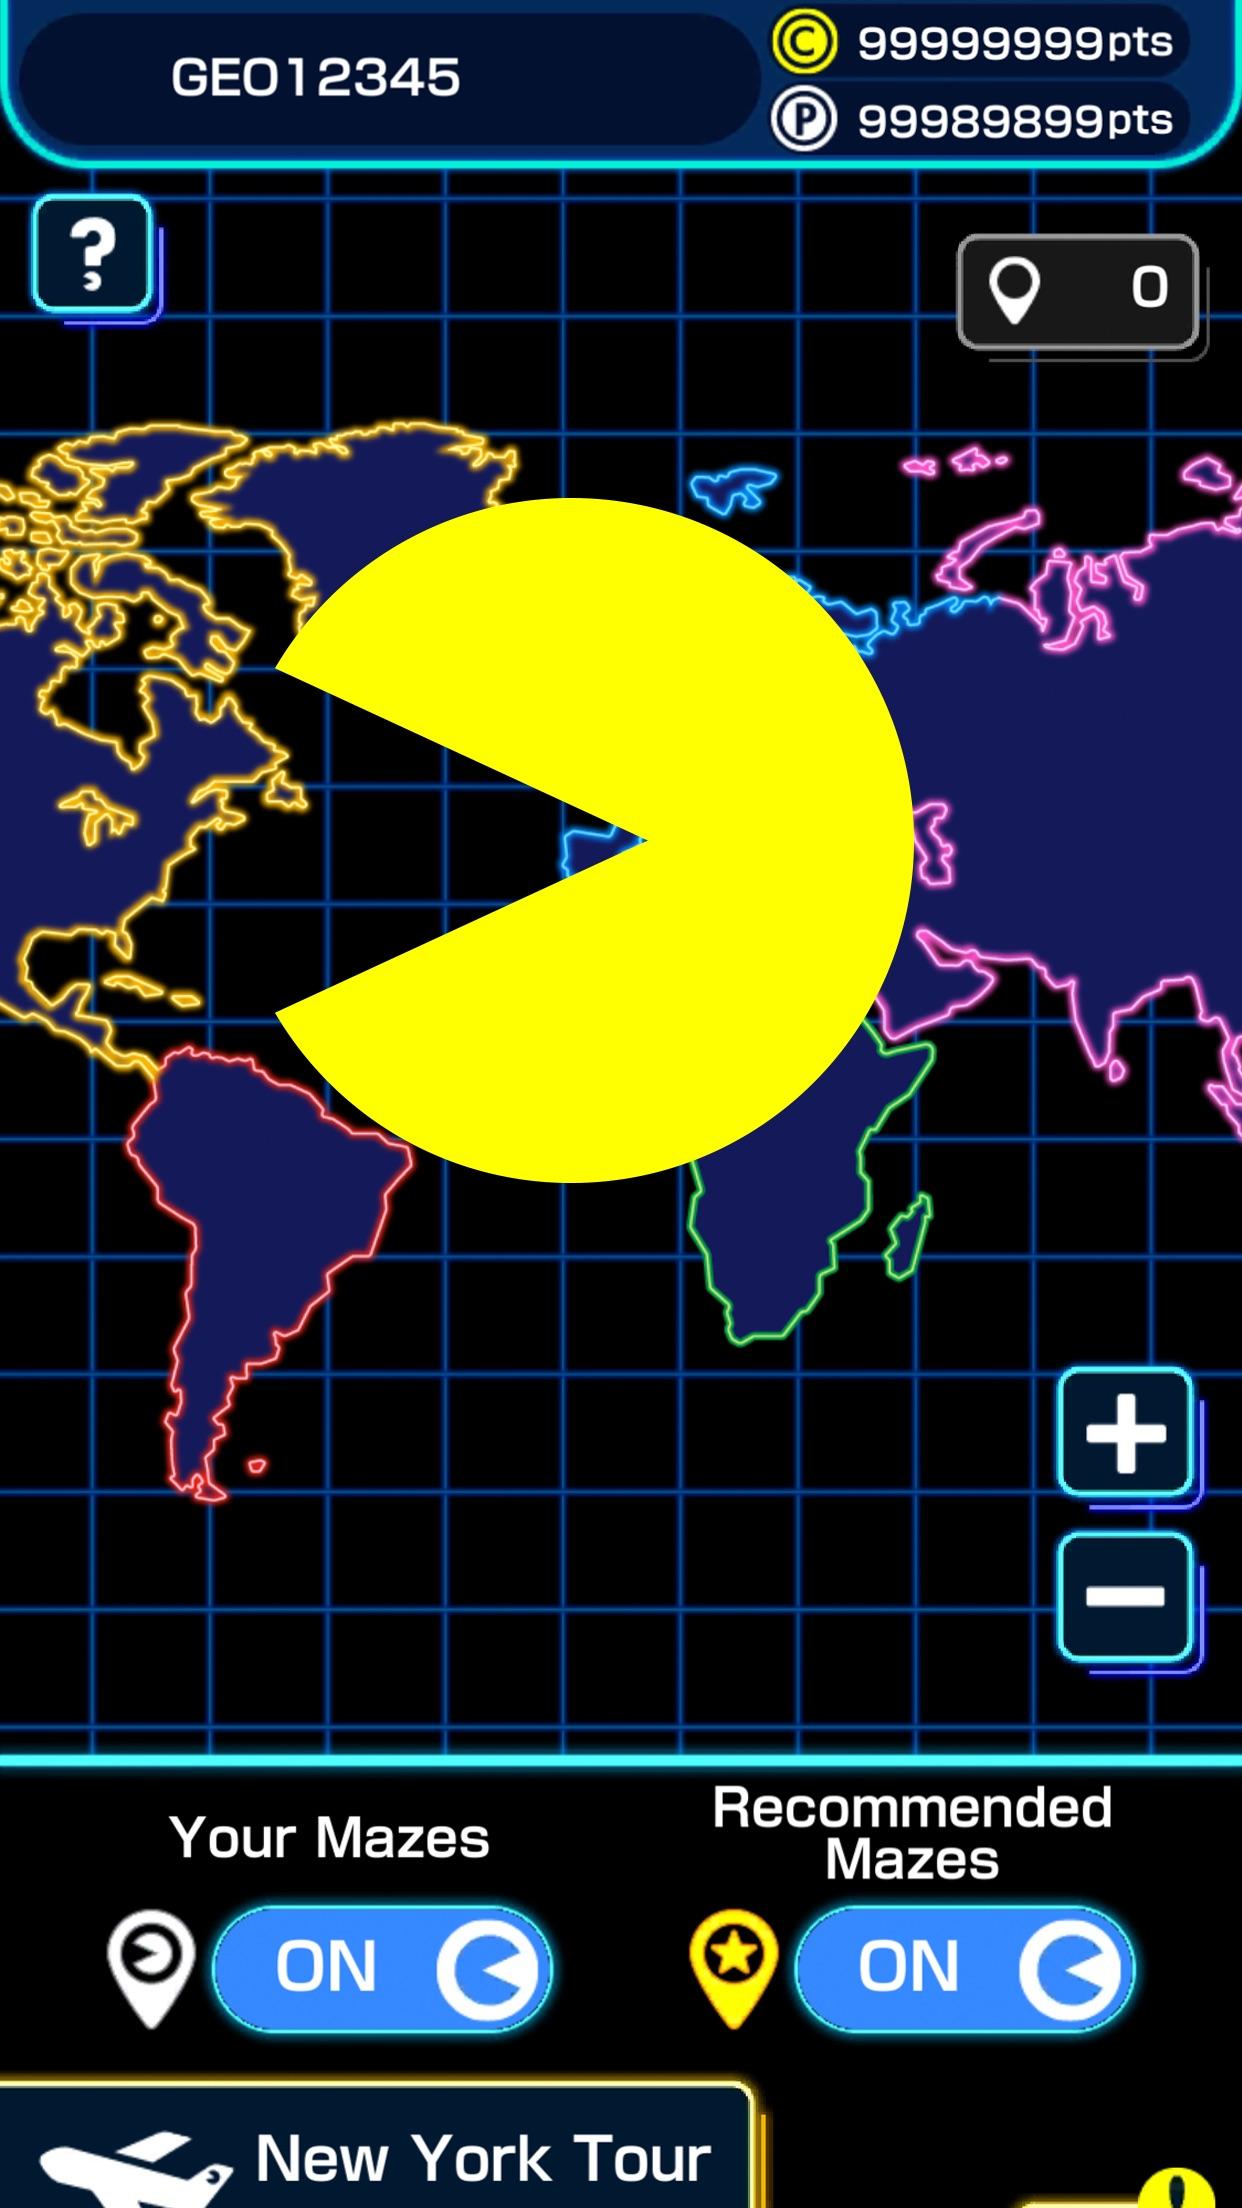 Screenshot do app PAC-MAN GEO